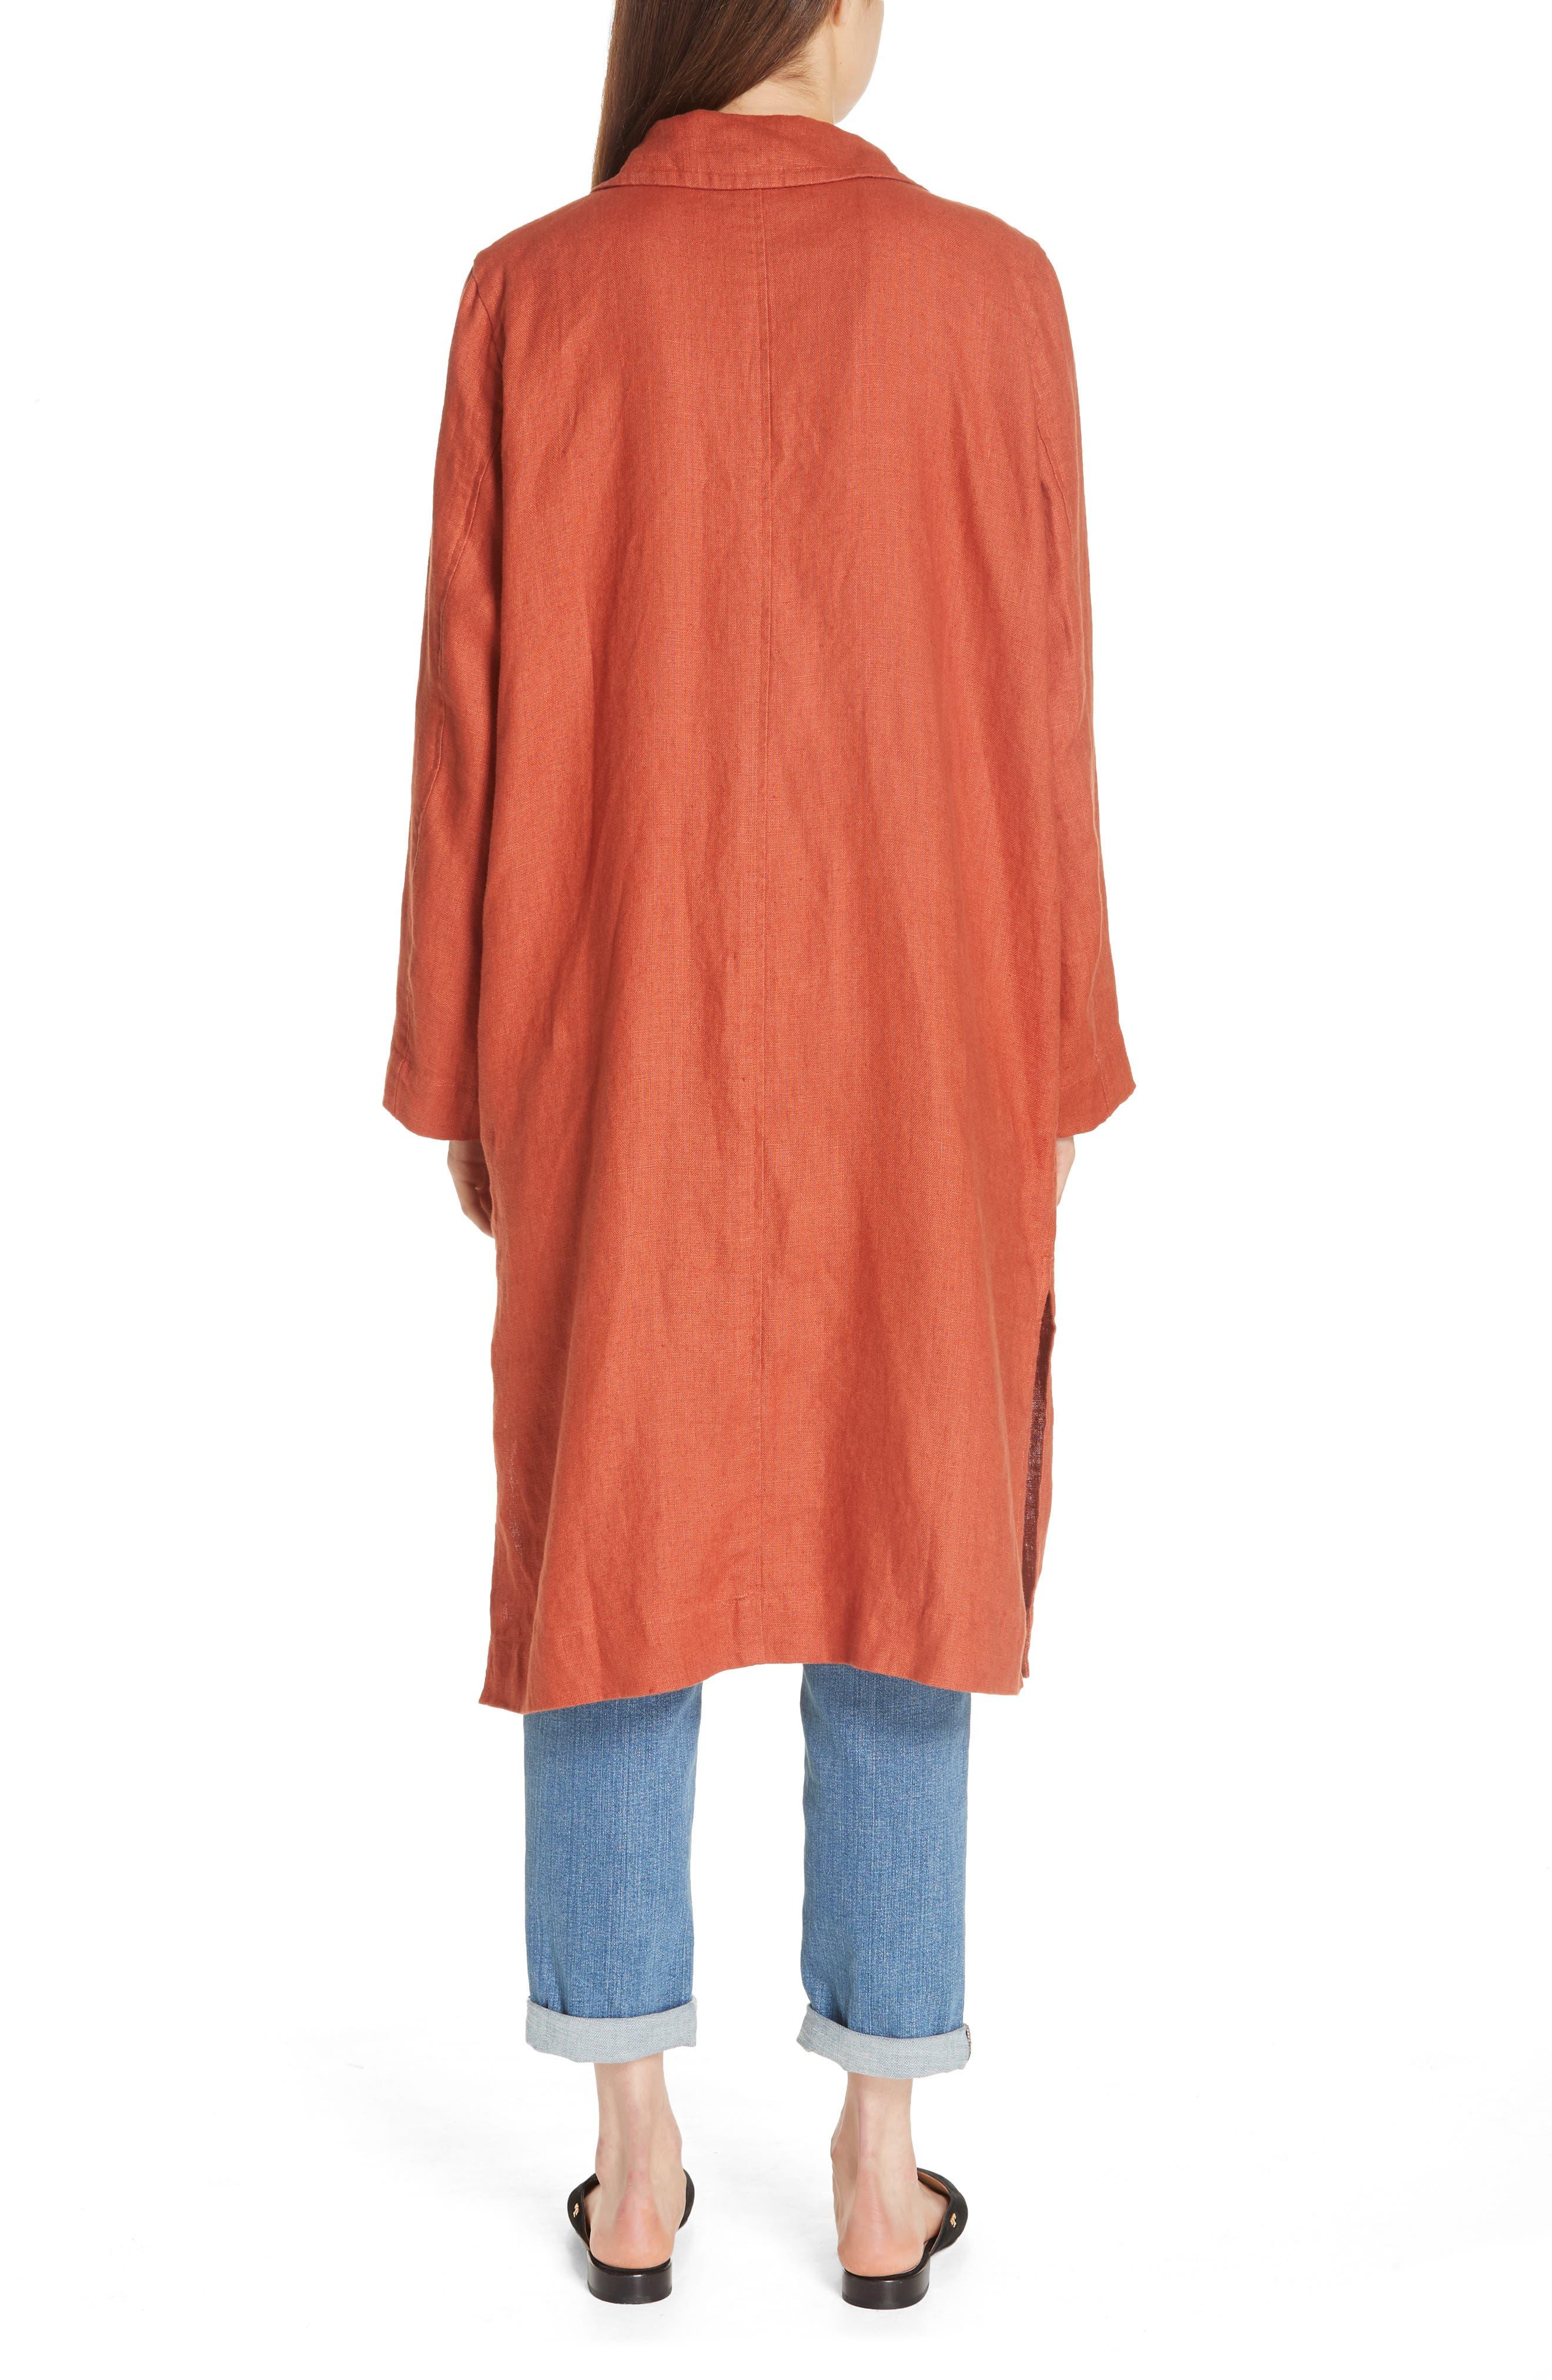 Organic Linen Trench Coat,                             Alternate thumbnail 2, color,                             822